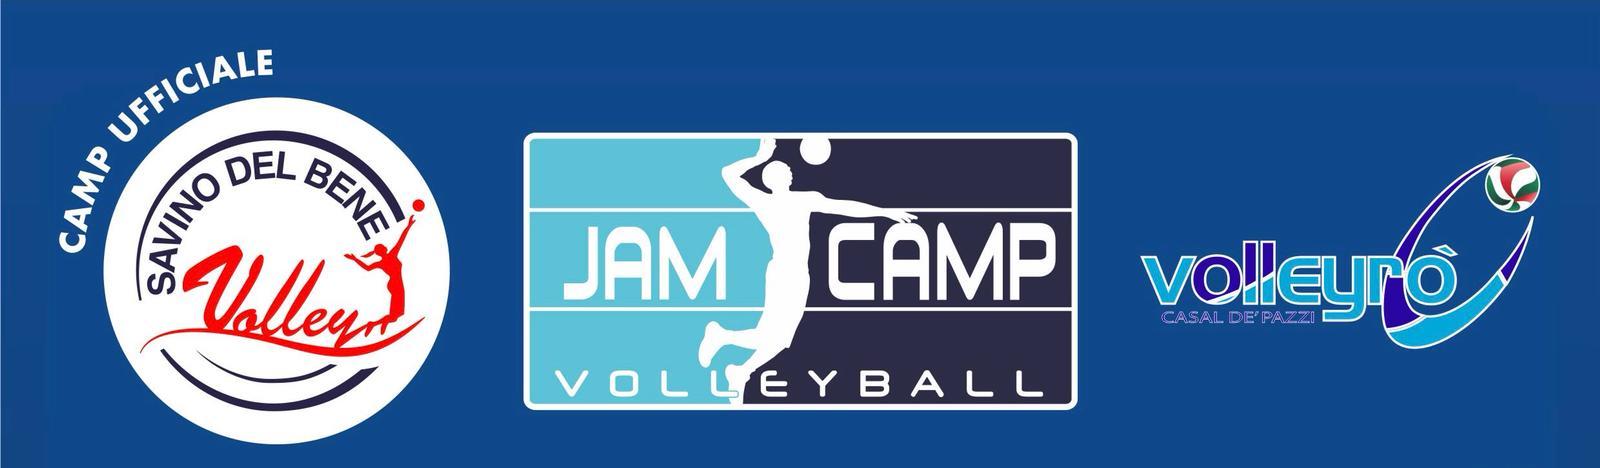 Iscriviti ora al Jam Camp!